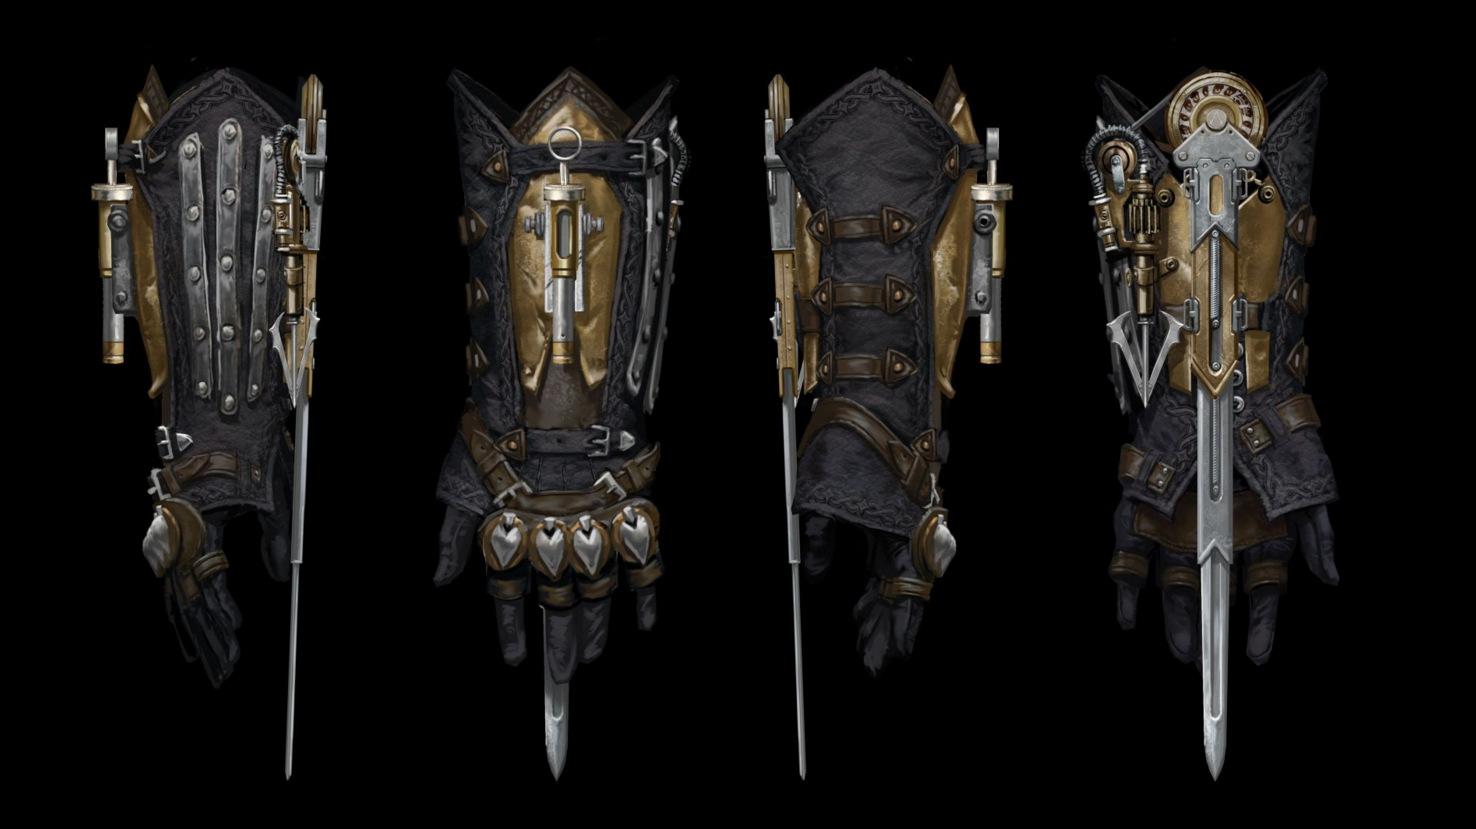 Assassin's Creed Syndicate garfio (2)